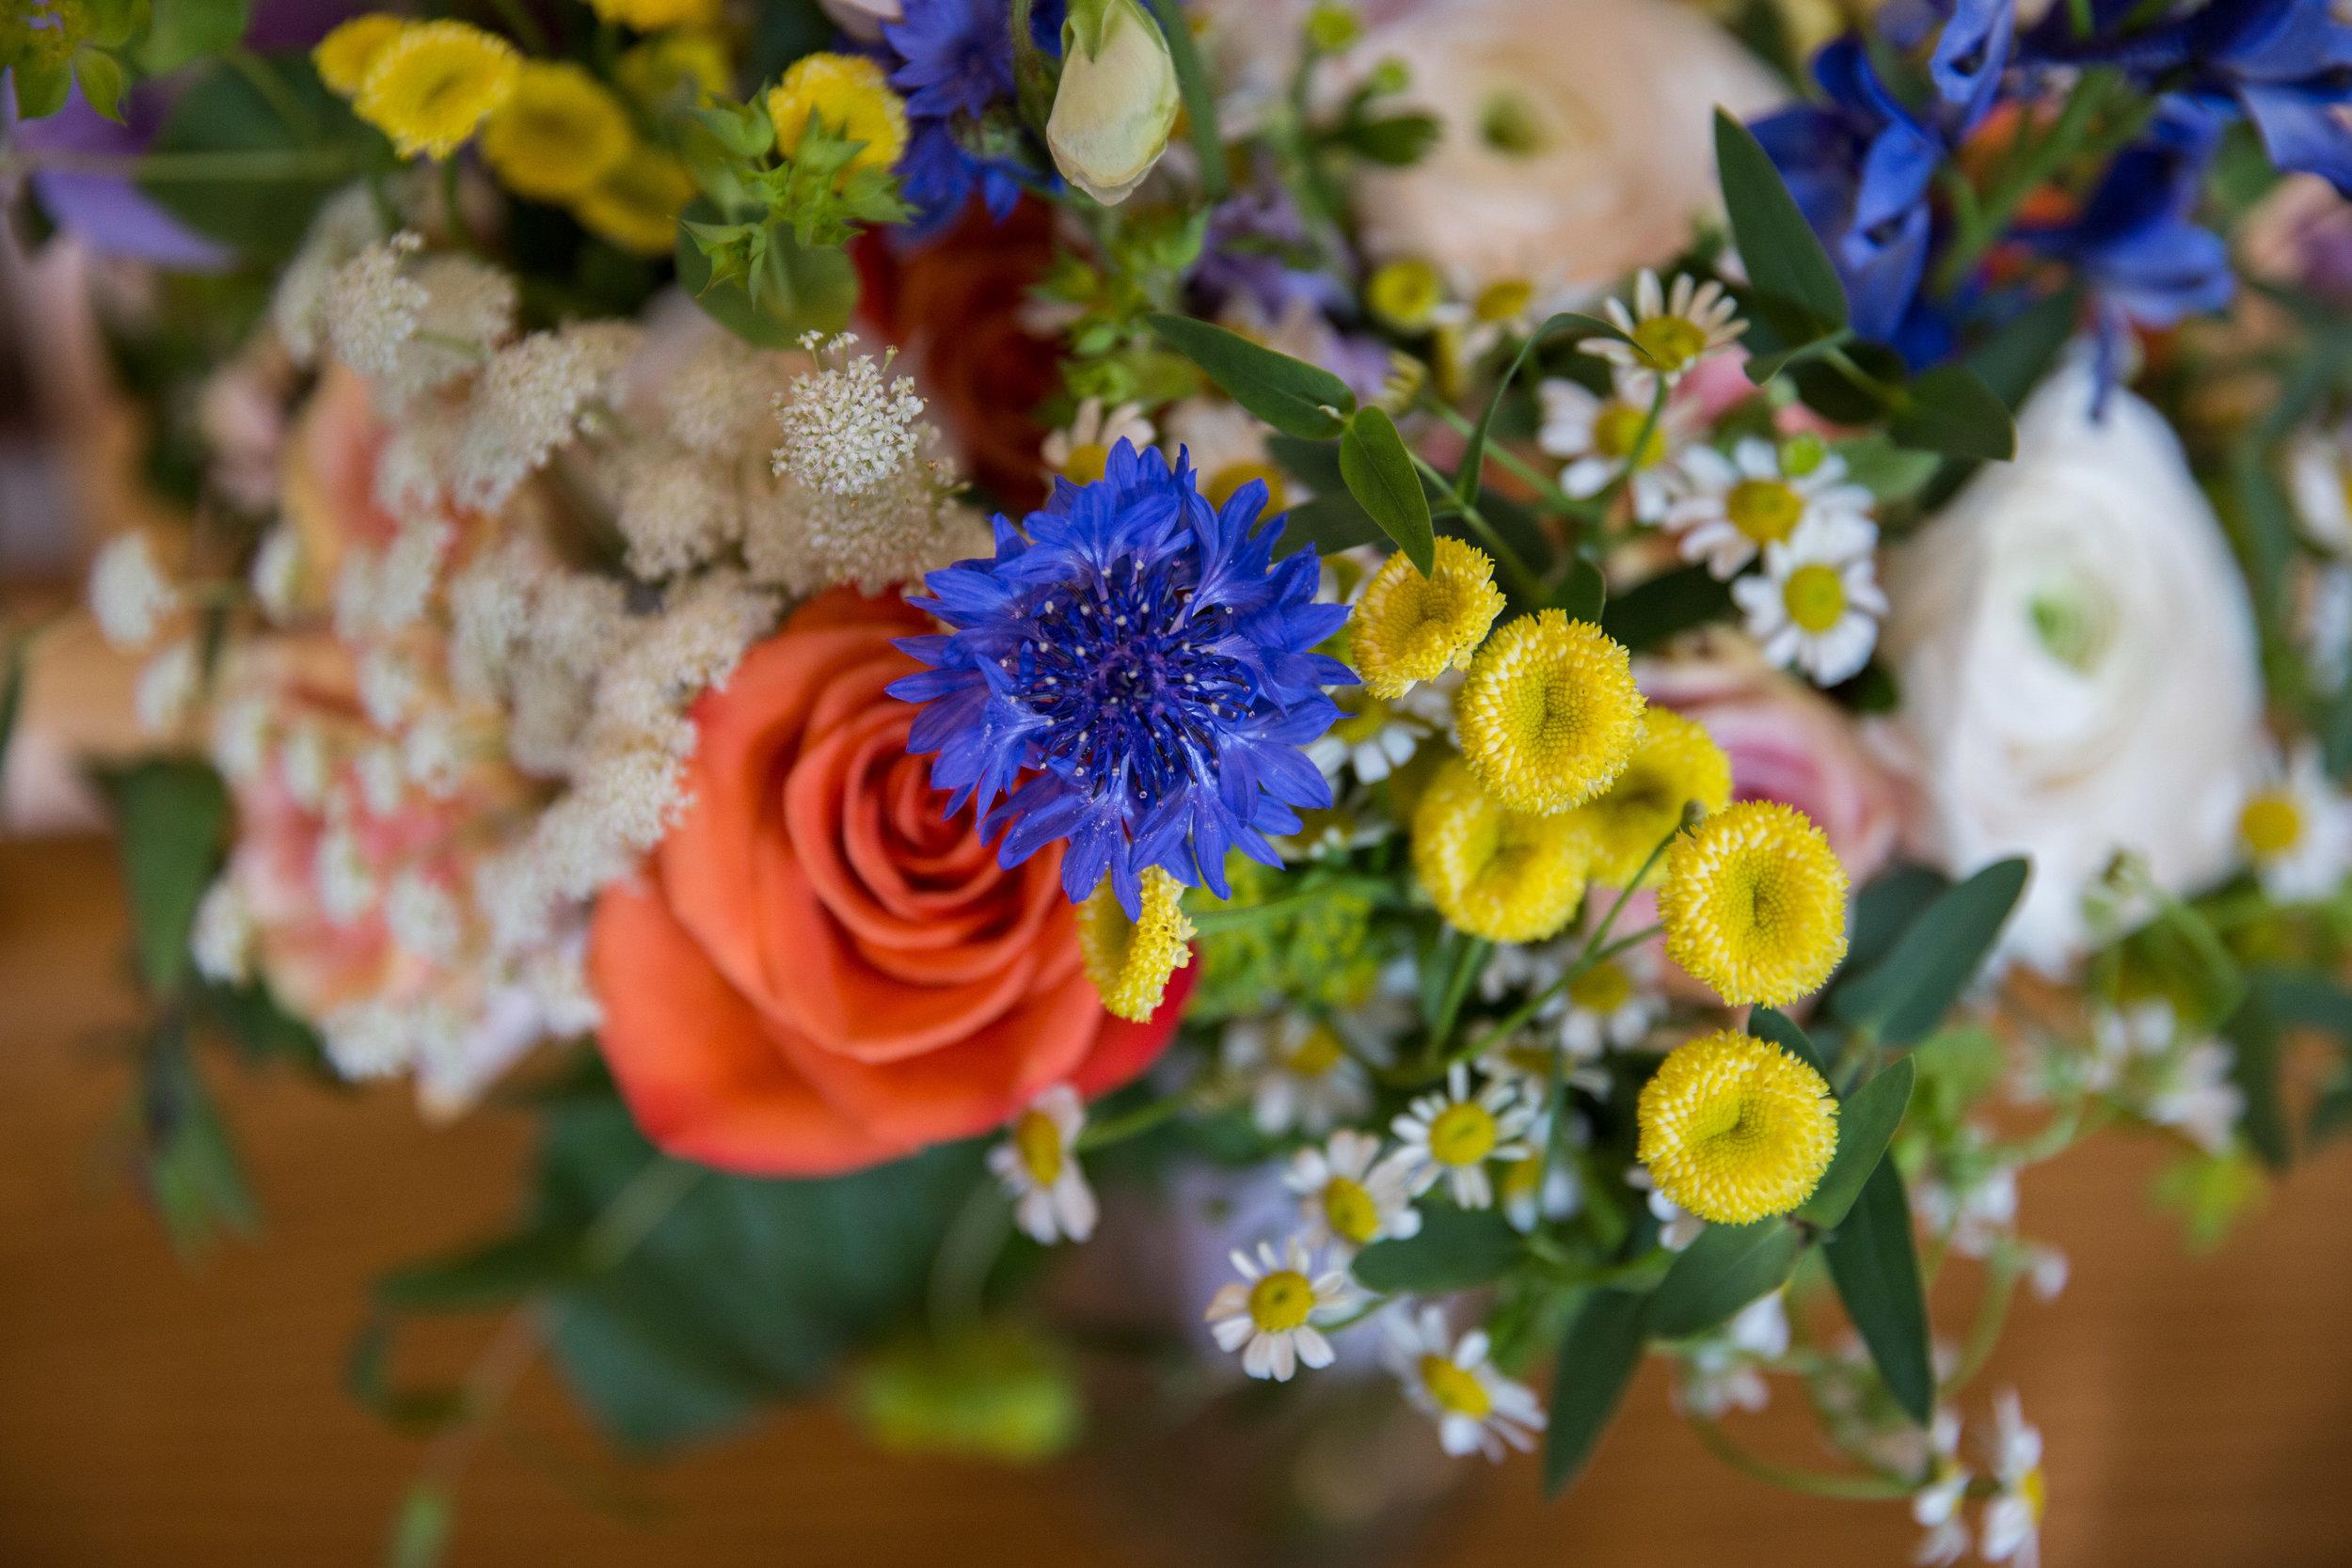 Natalie and Dallas Mooney Wedding 6-8-19_Tania Watt Photography-34.jpg